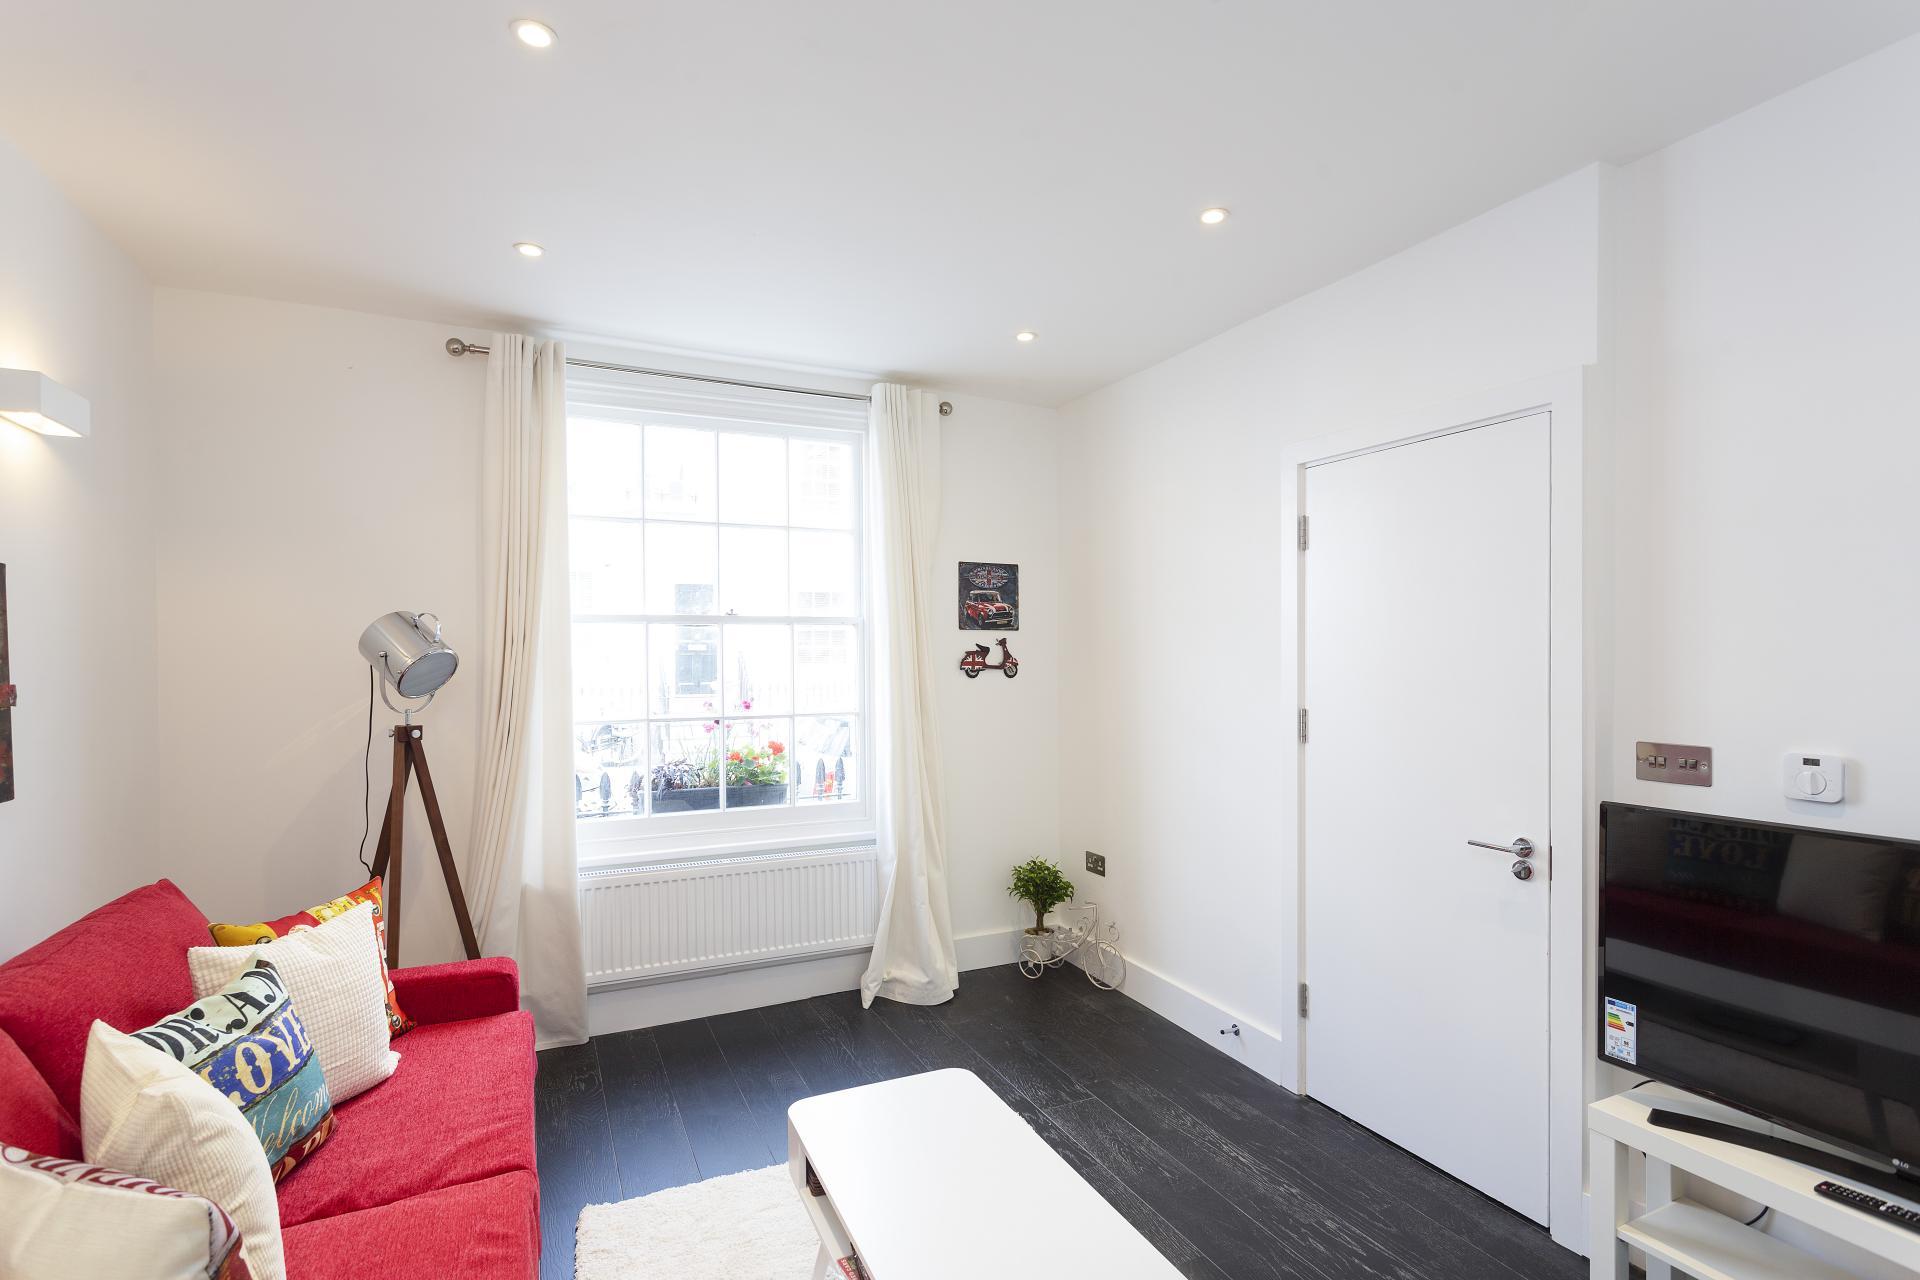 TV at Luxury Knightsbridge House, Knightsbridge, London - Citybase Apartments